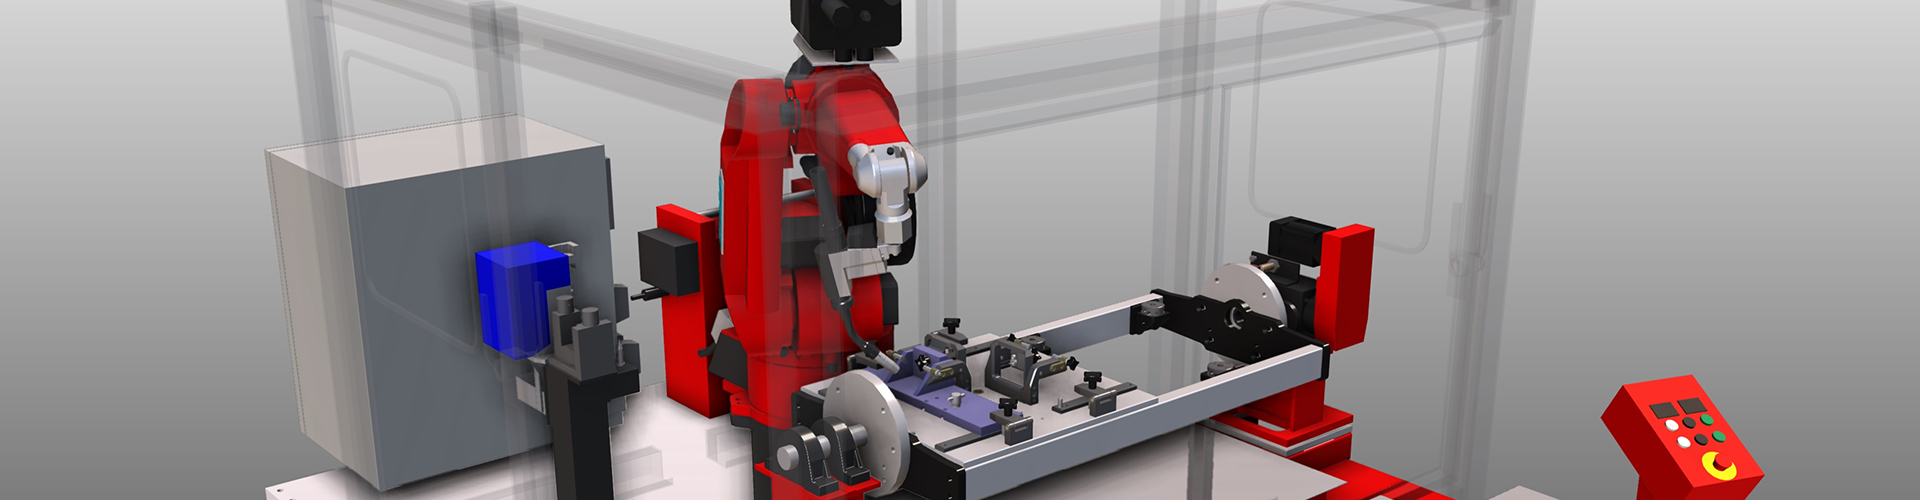 Reis弧焊机器人离线编程